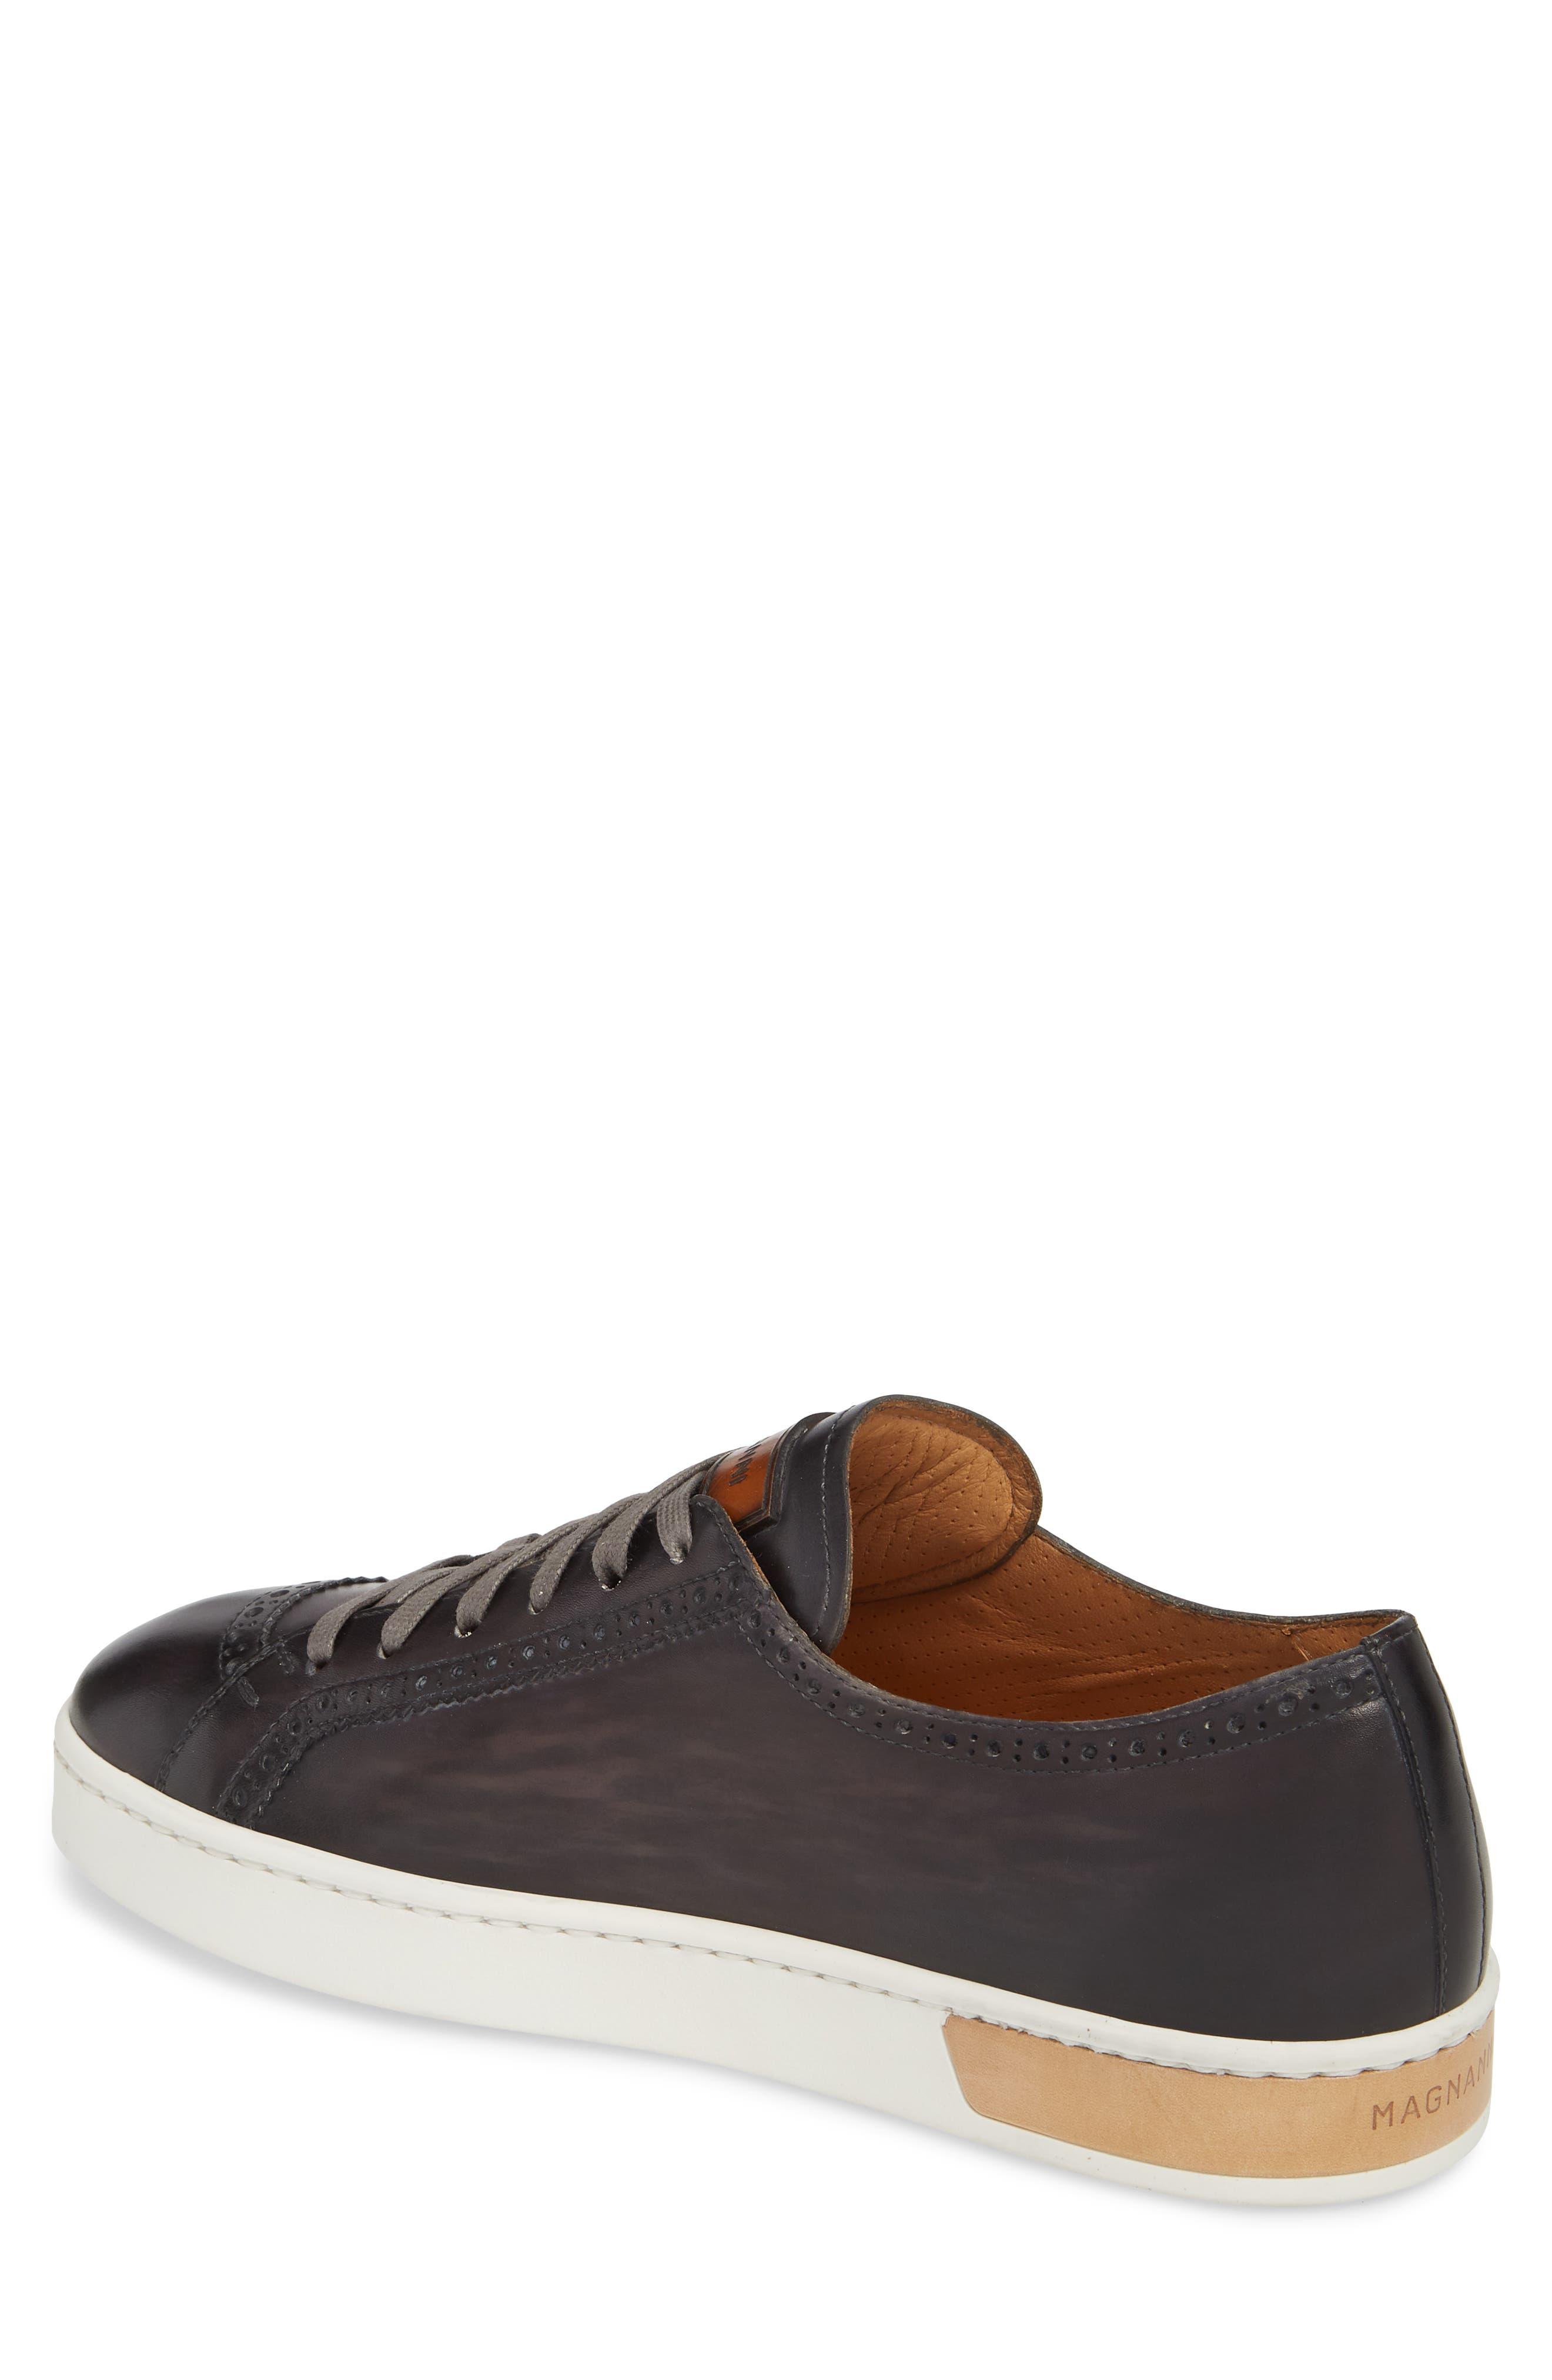 Juniper Brogued Low Top Sneaker,                             Alternate thumbnail 2, color,                             Grey Leather